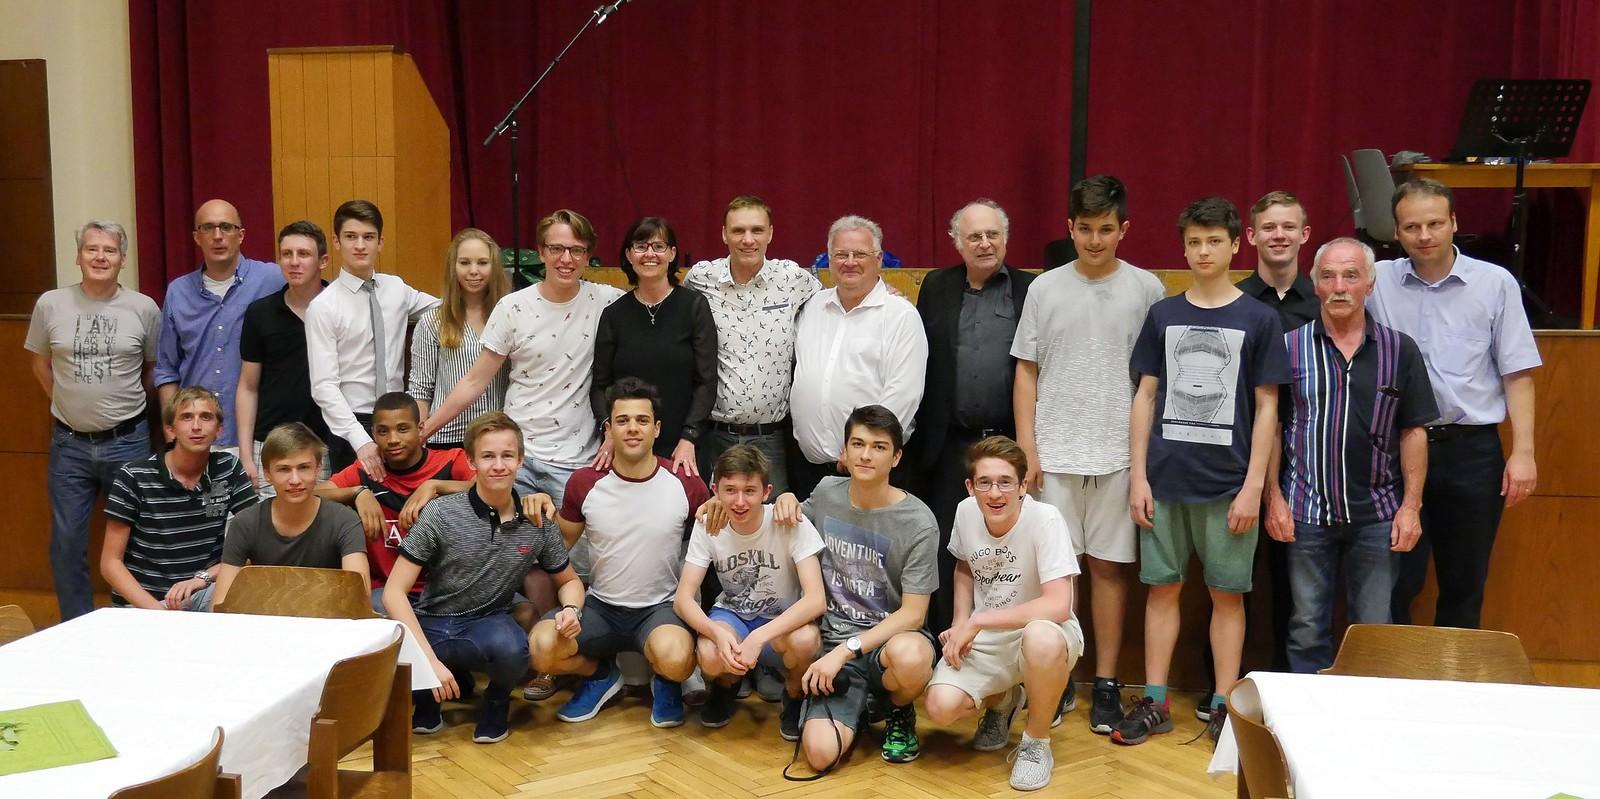 70-Jahresfeier TTC Flötzersteig-Sportklub